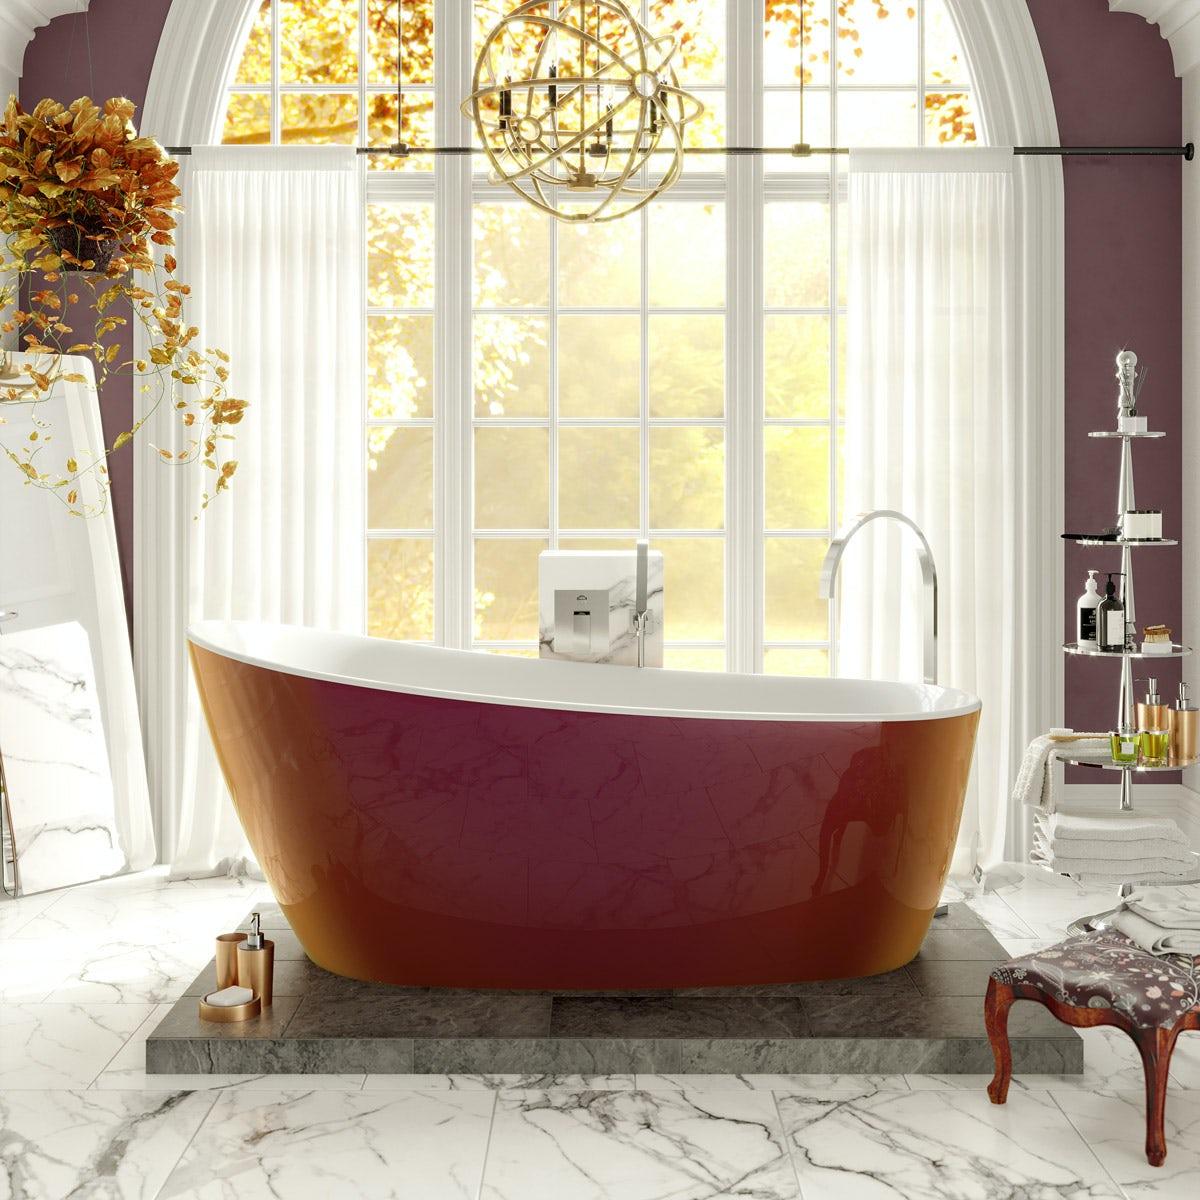 Belle de Louvain Camesi freestanding bath